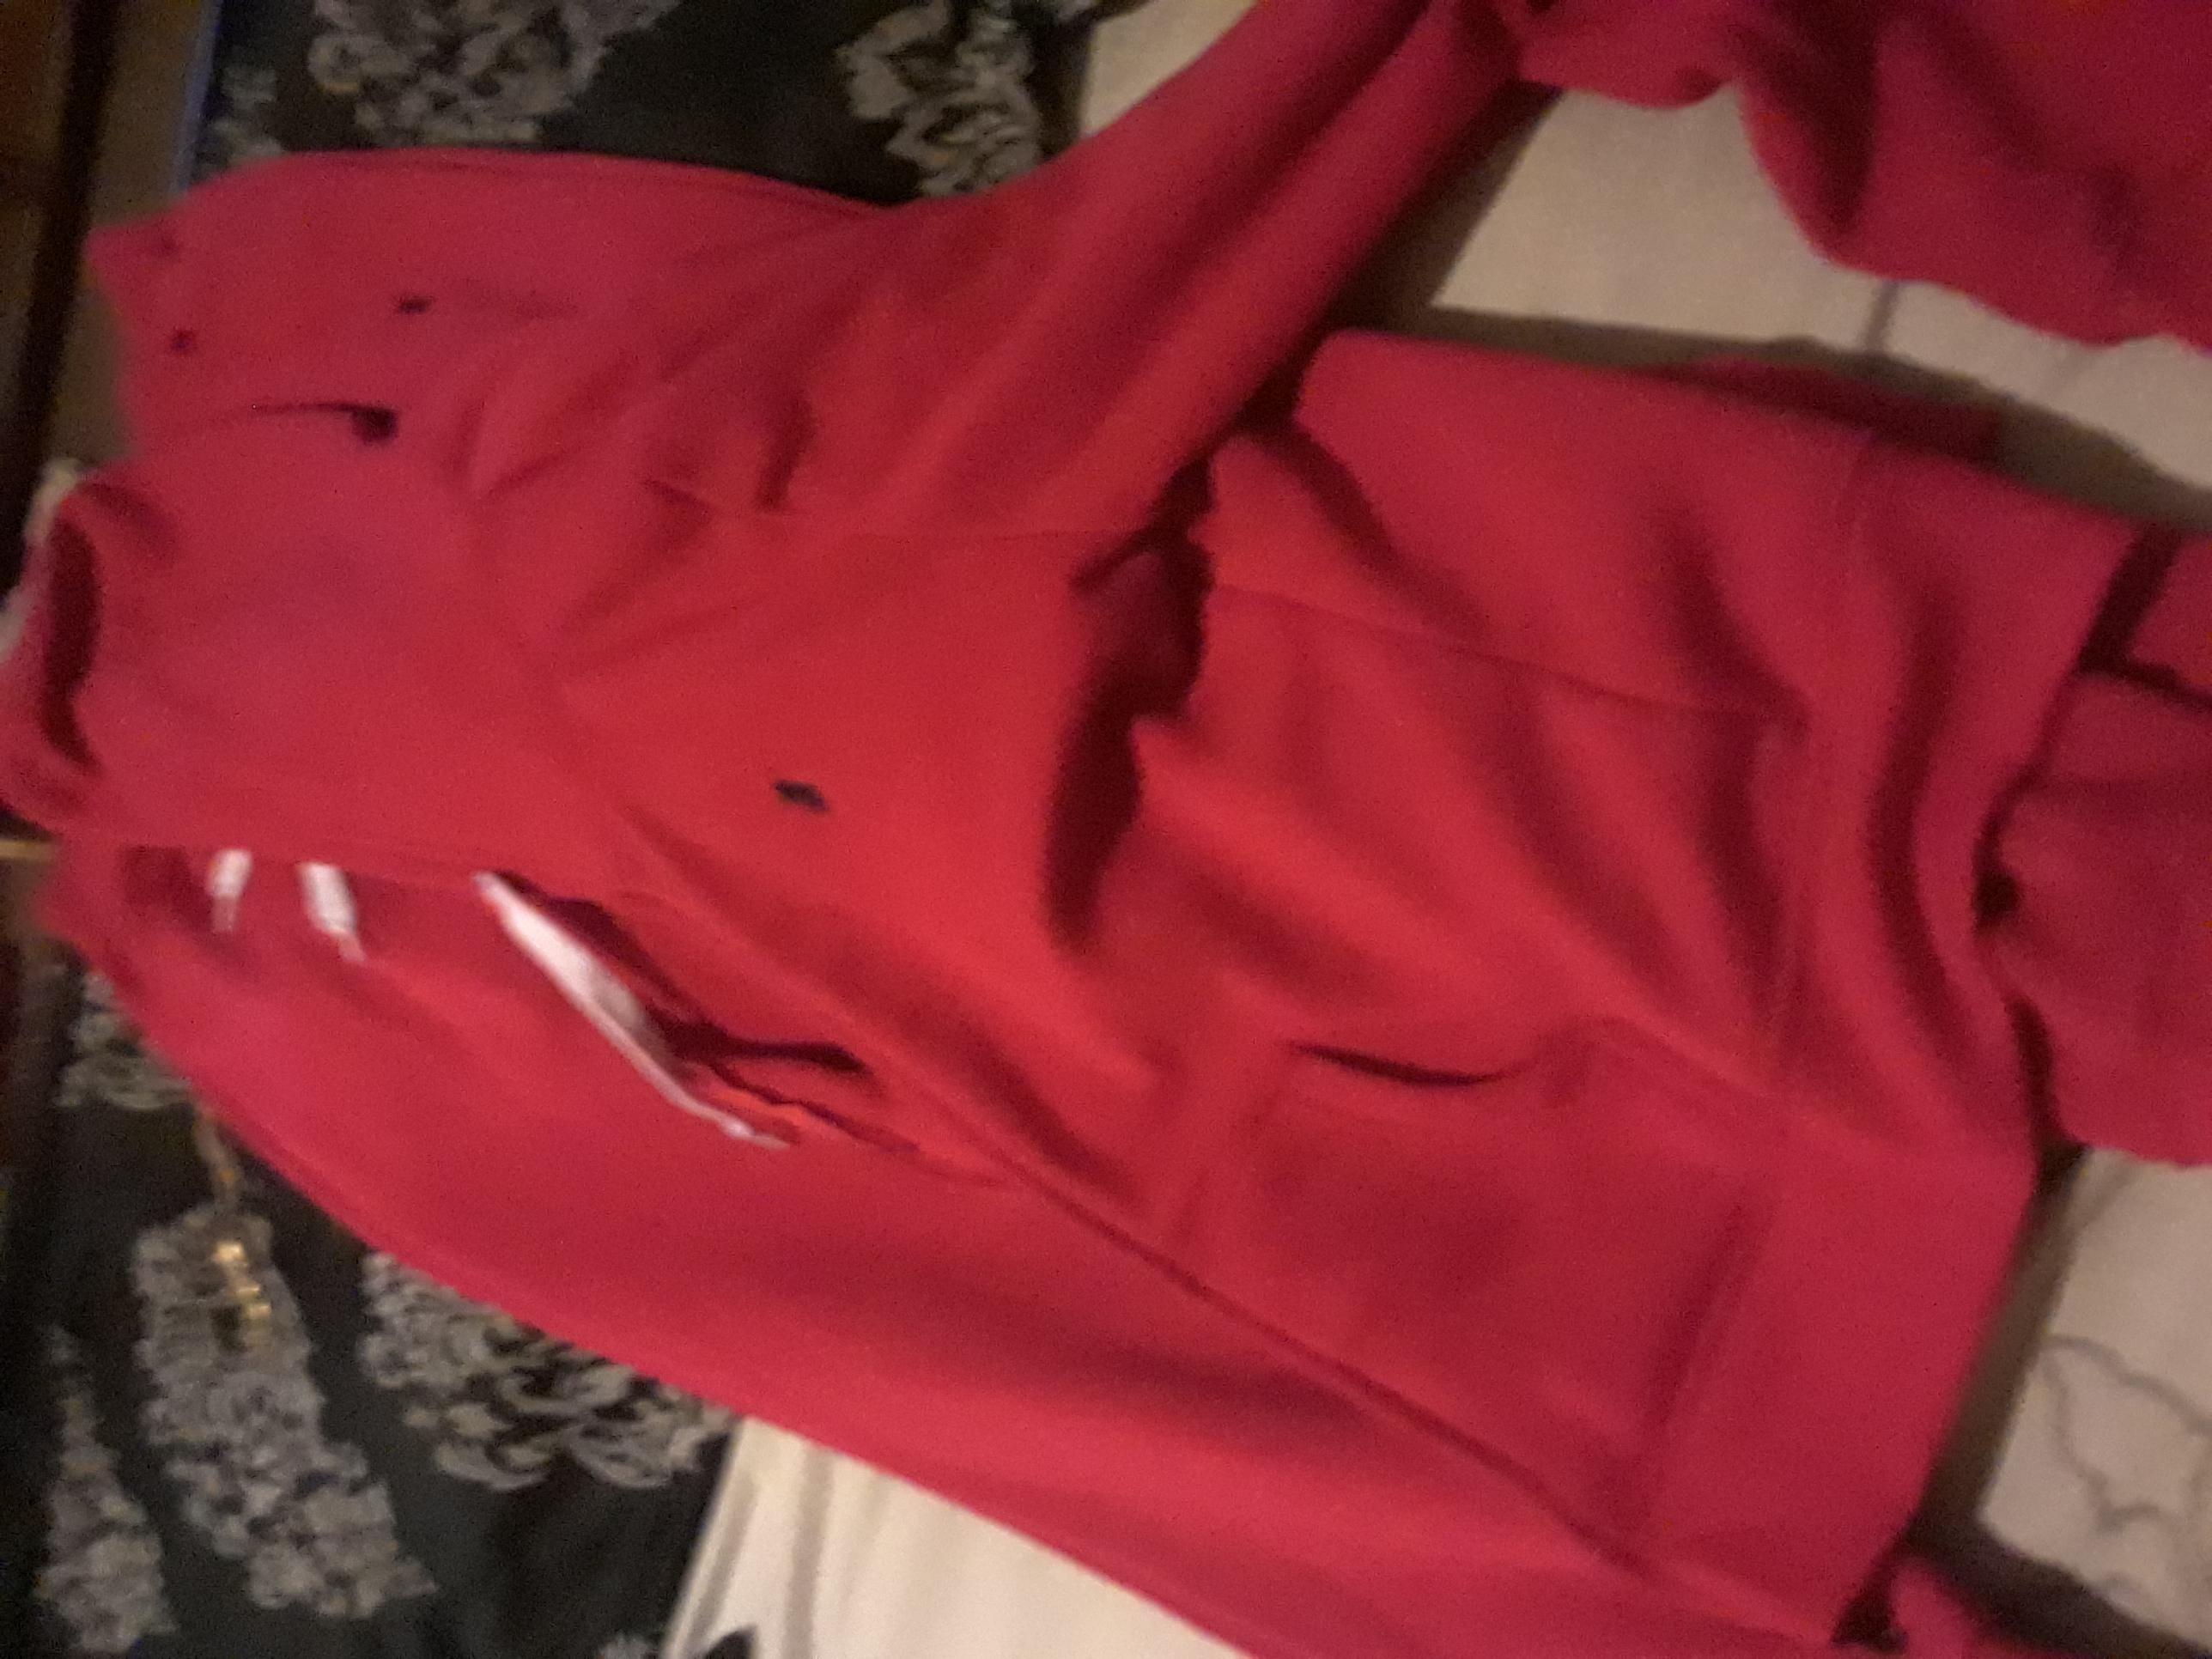 Polo jogger suit